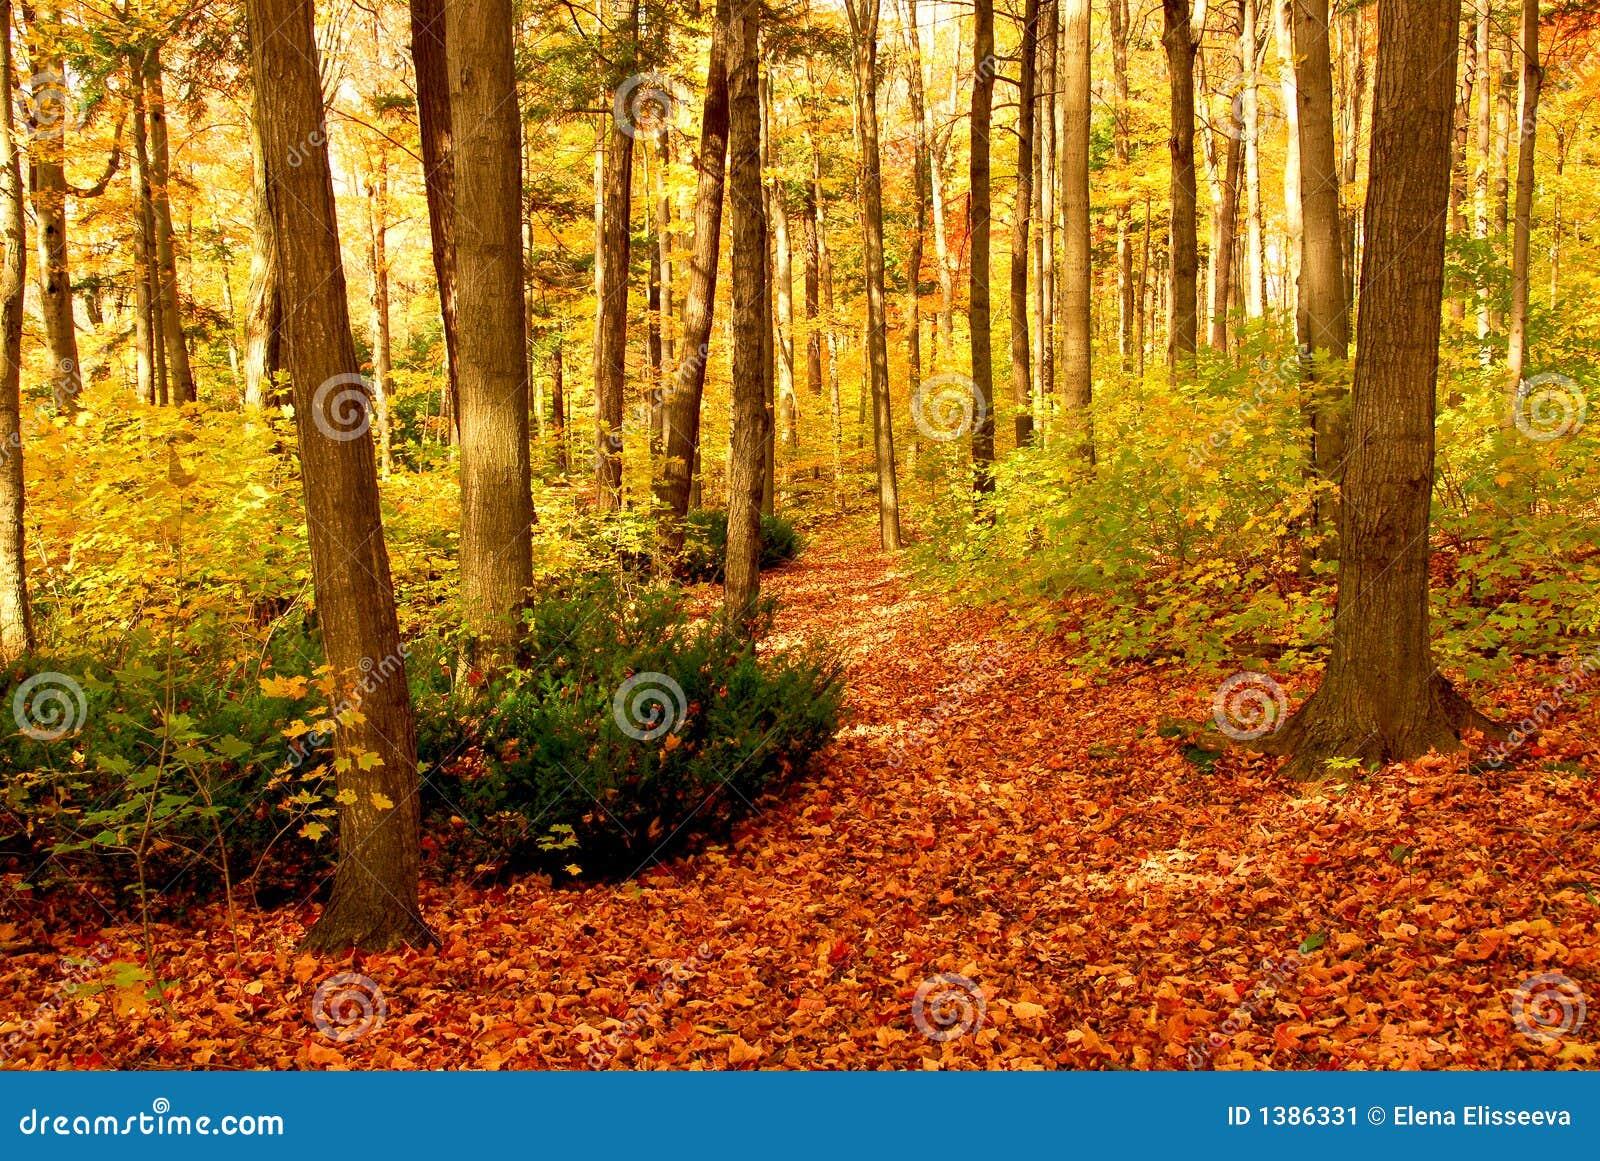 fall leaves wallpaper desktop